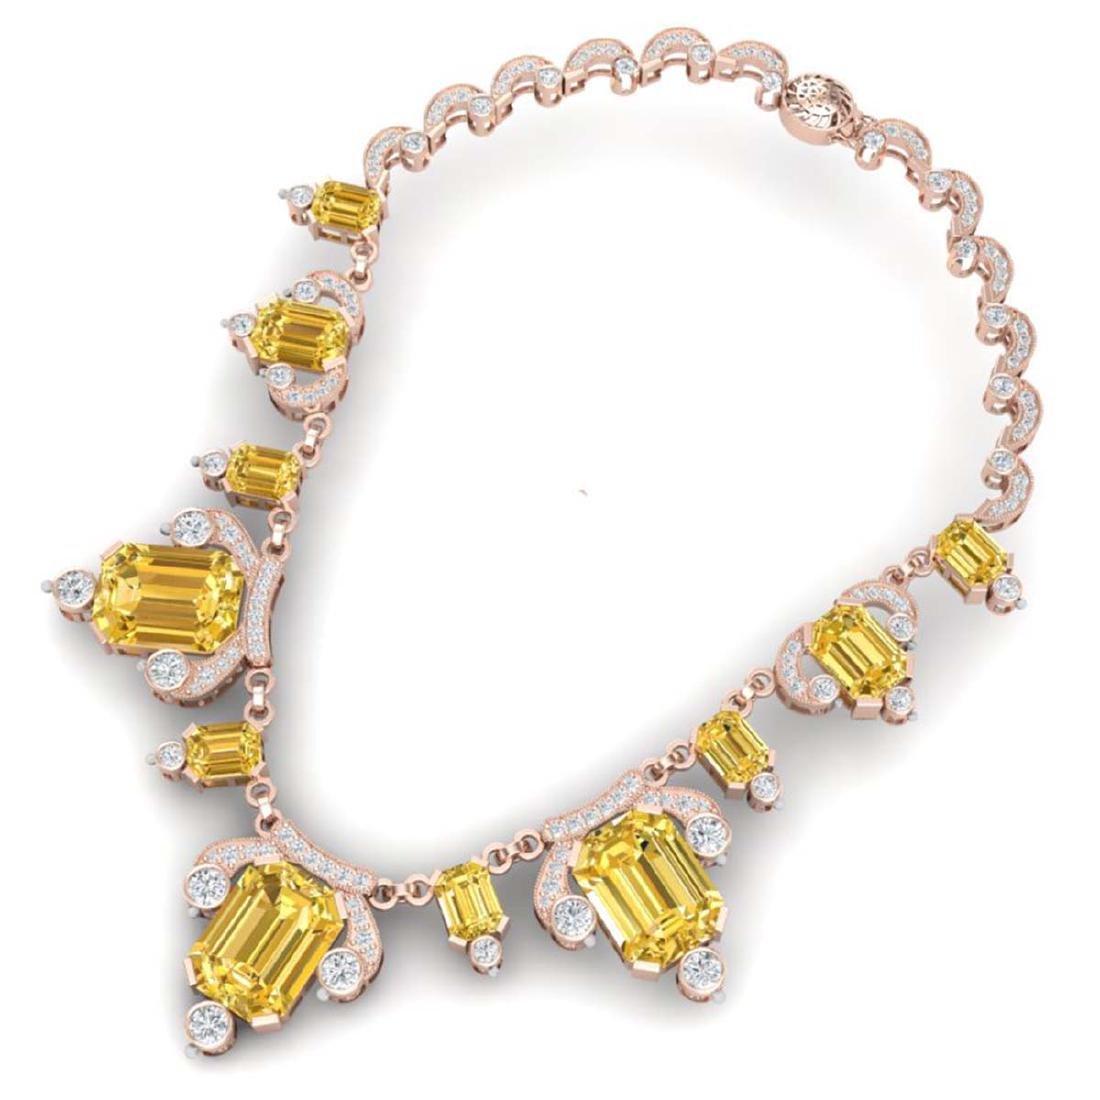 71.48 ctw Canary Citrine & VS Diamond Necklace 18K Rose - 3